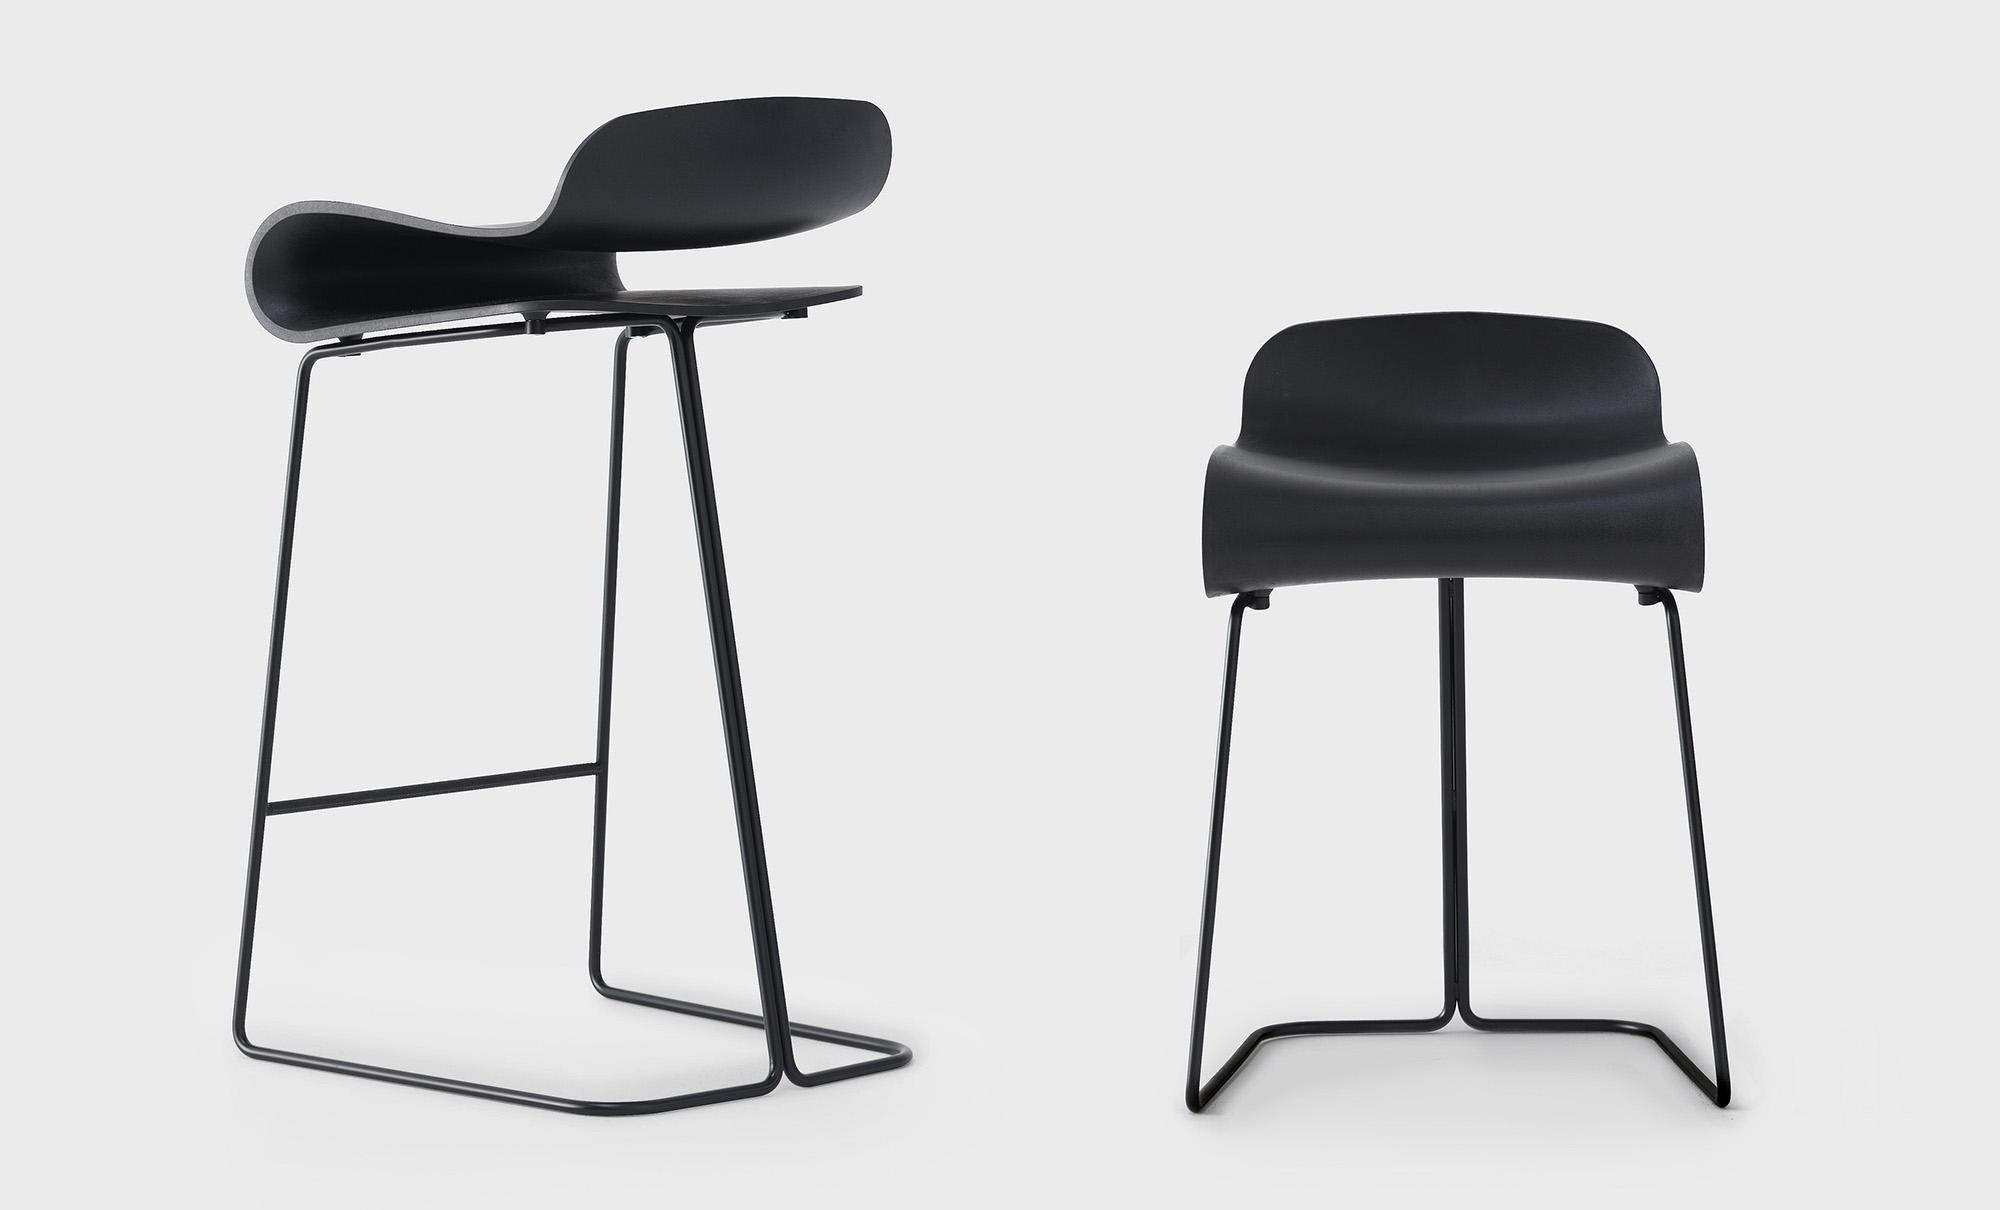 bcn slide base stool. Interior Design Ideas. Home Design Ideas